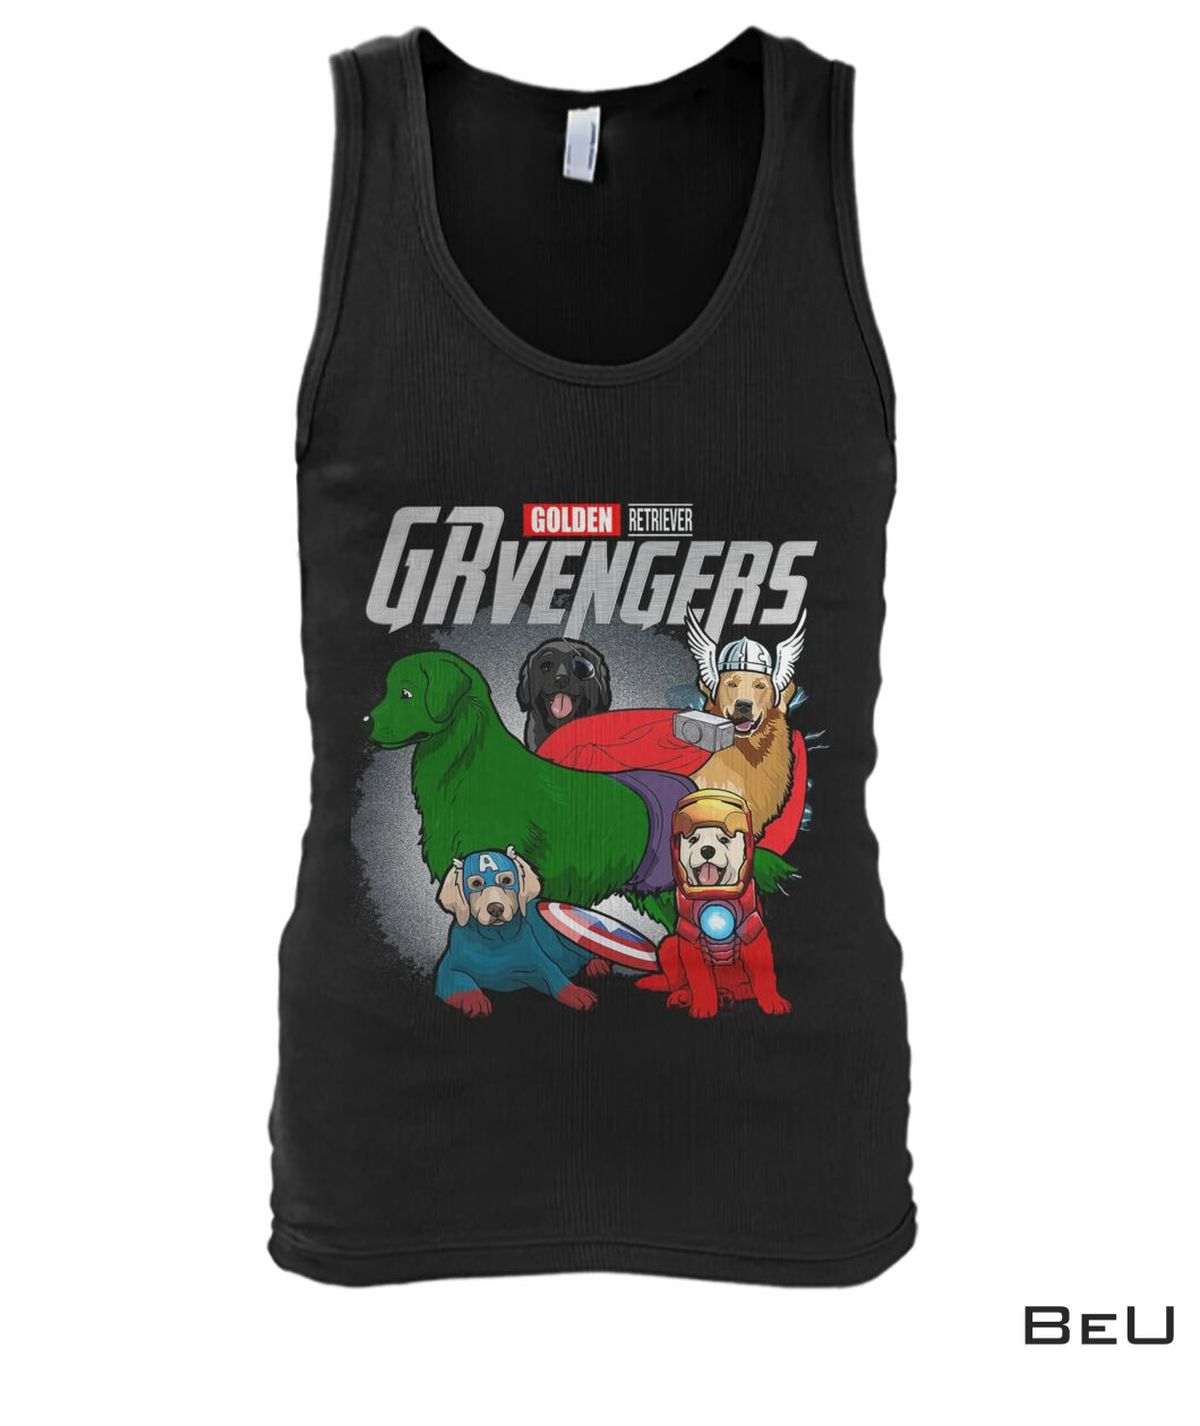 Golden Retriever GRvengers Avengers Shirtx